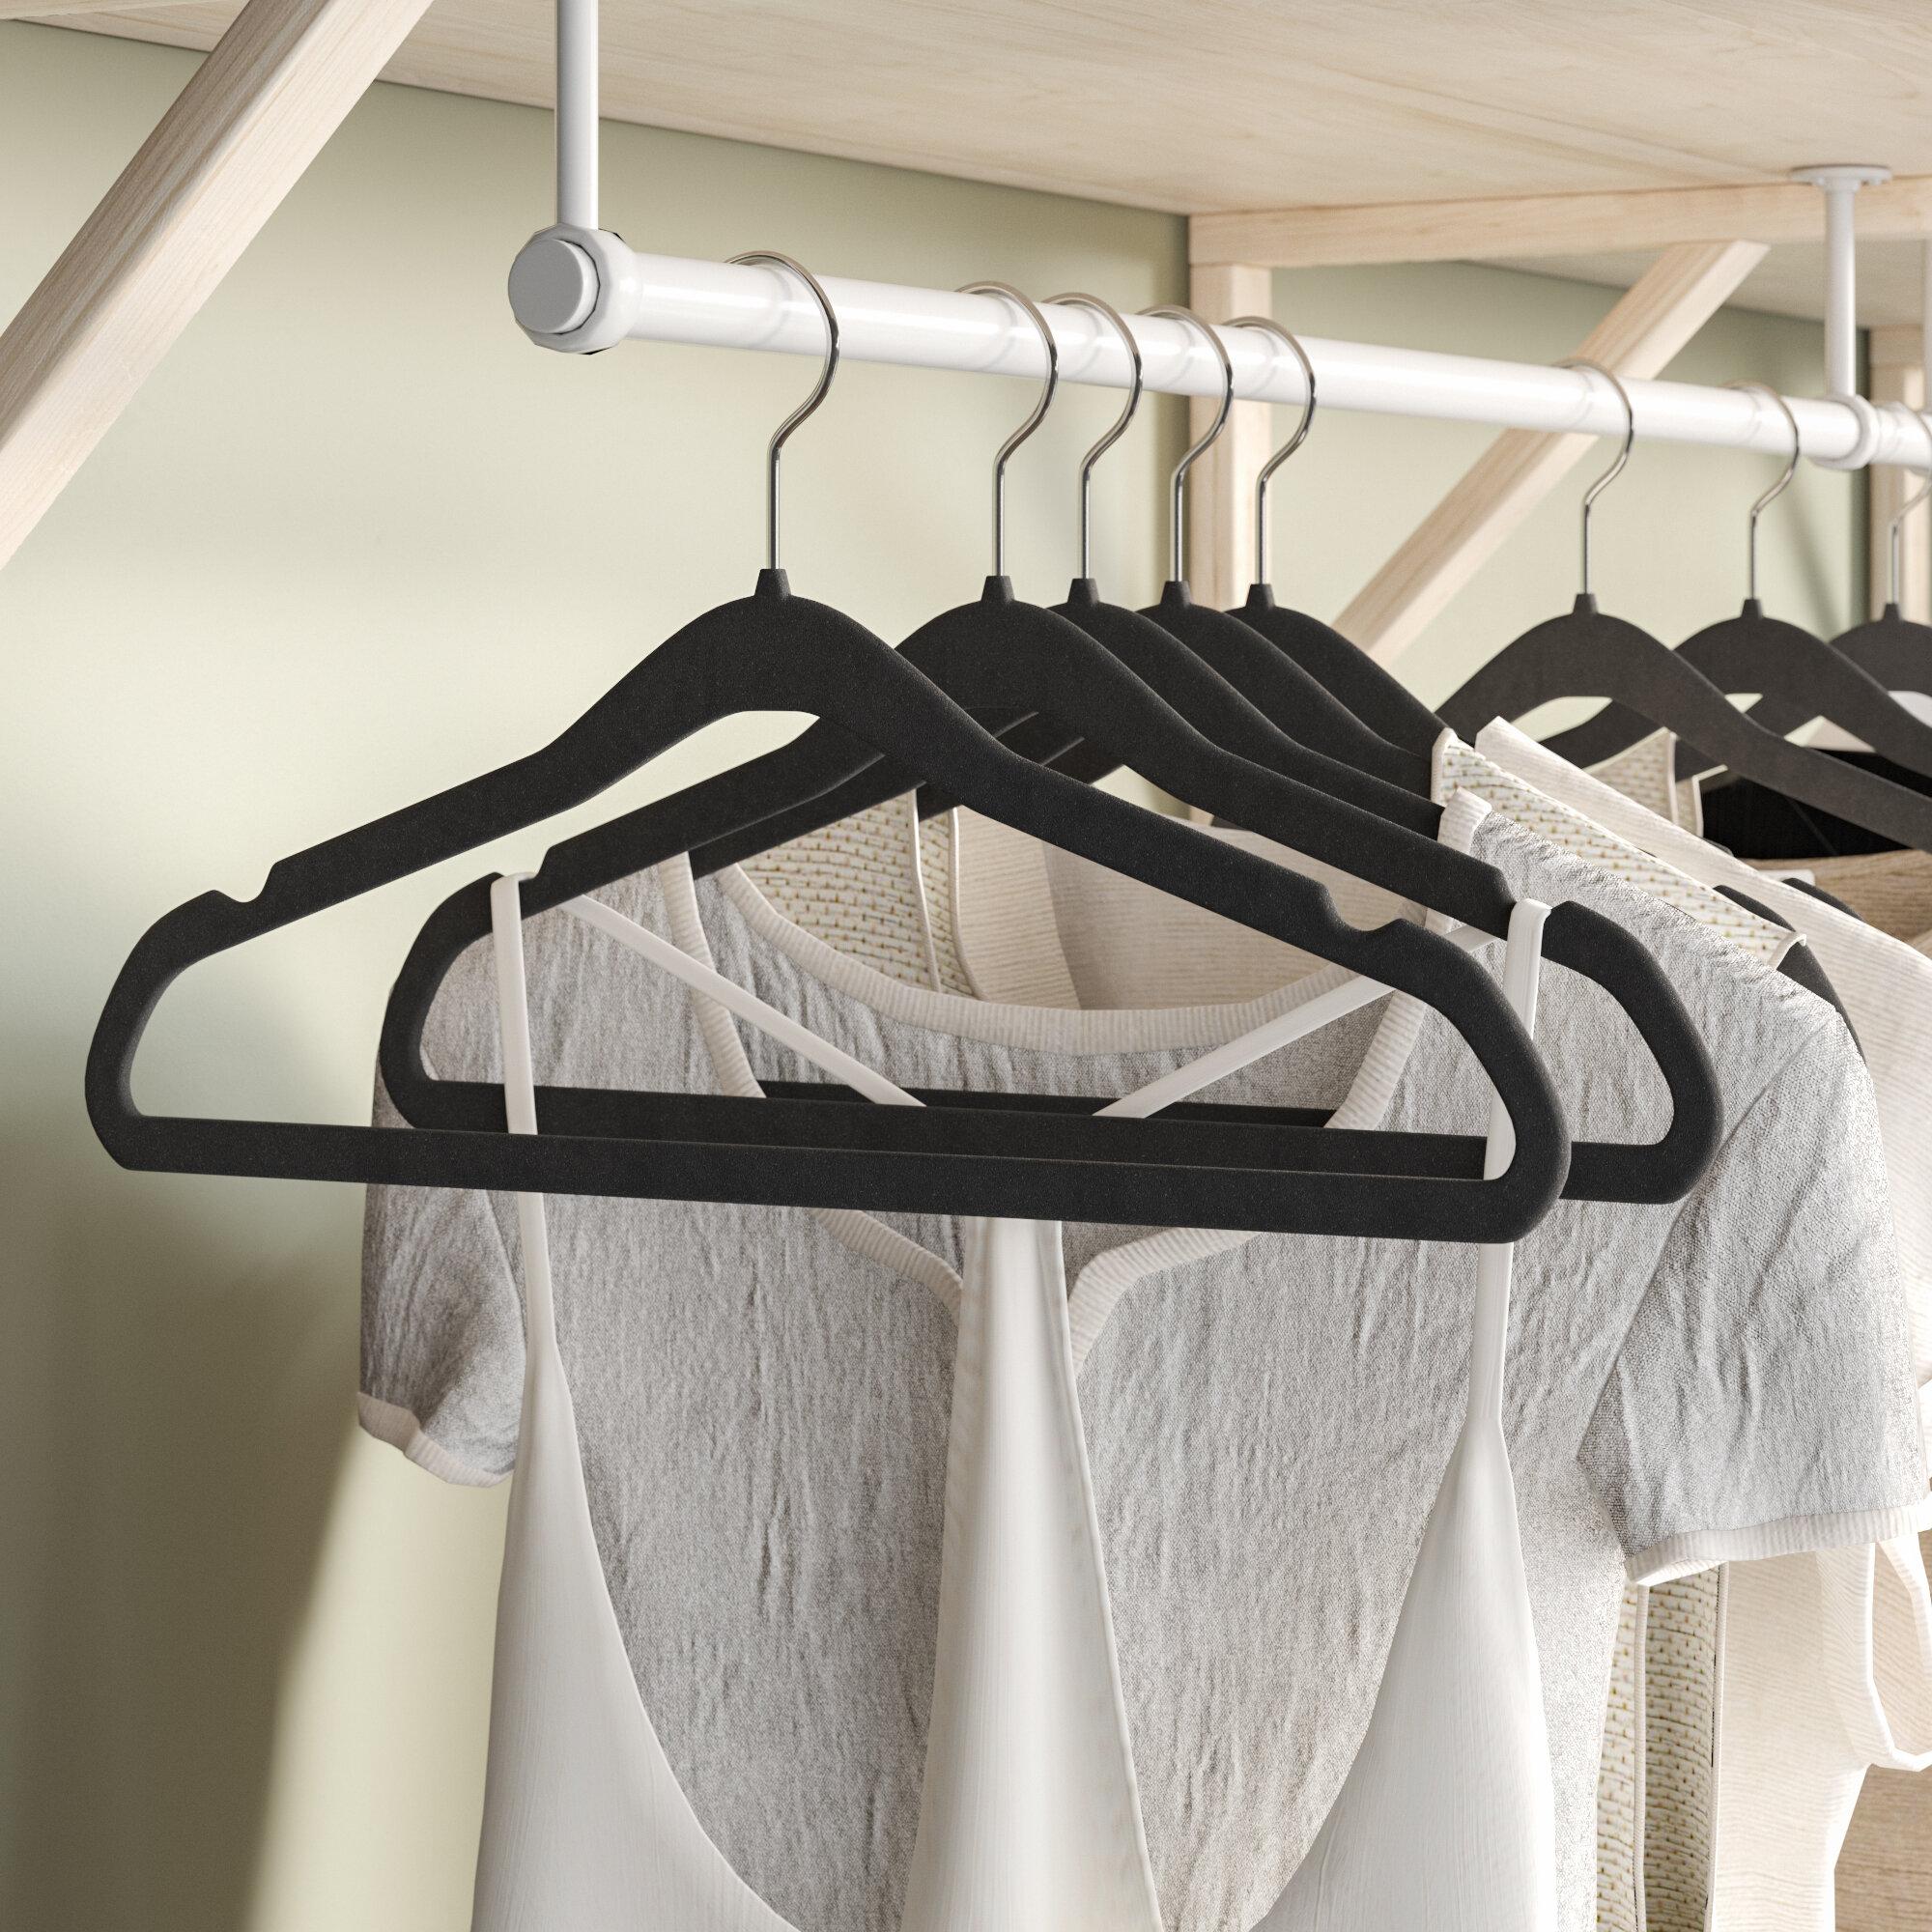 Coat Hangers Set of 200 Non-Slip Velvet Storage Holder Hanging Clothes Rack Red